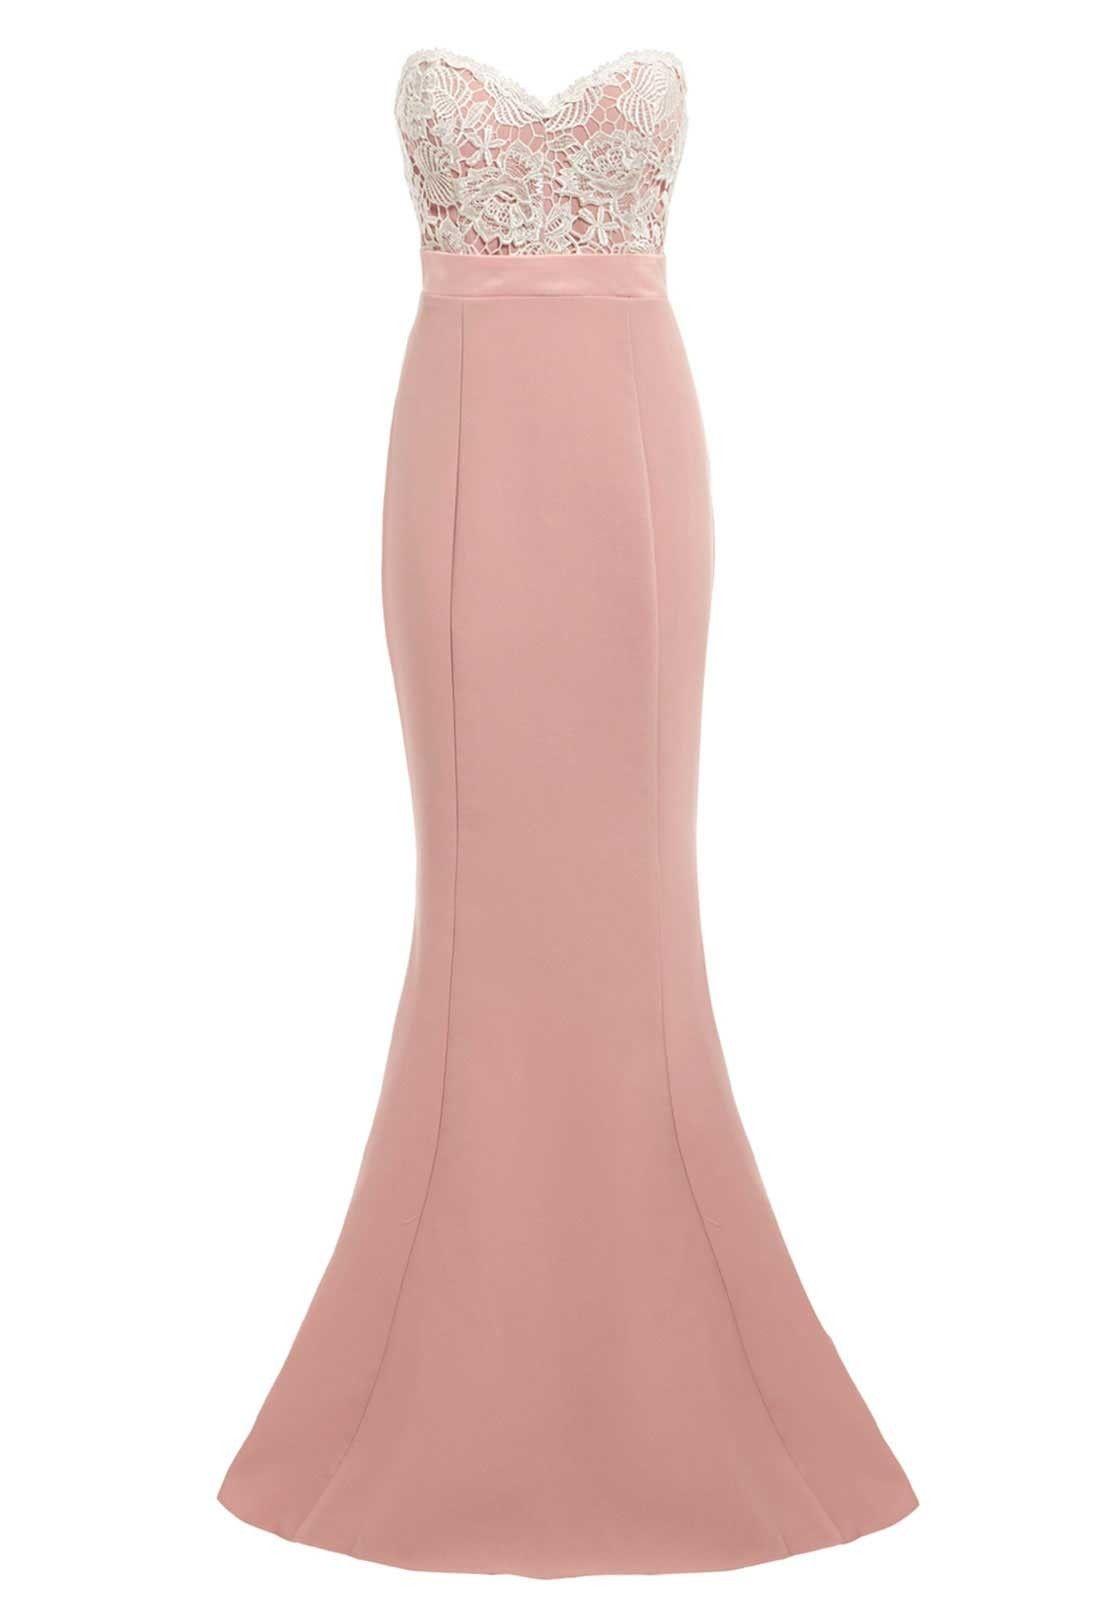 Elle Zeitoune Kiara Strapless Lace Bust Maxi Dress in Blush ...